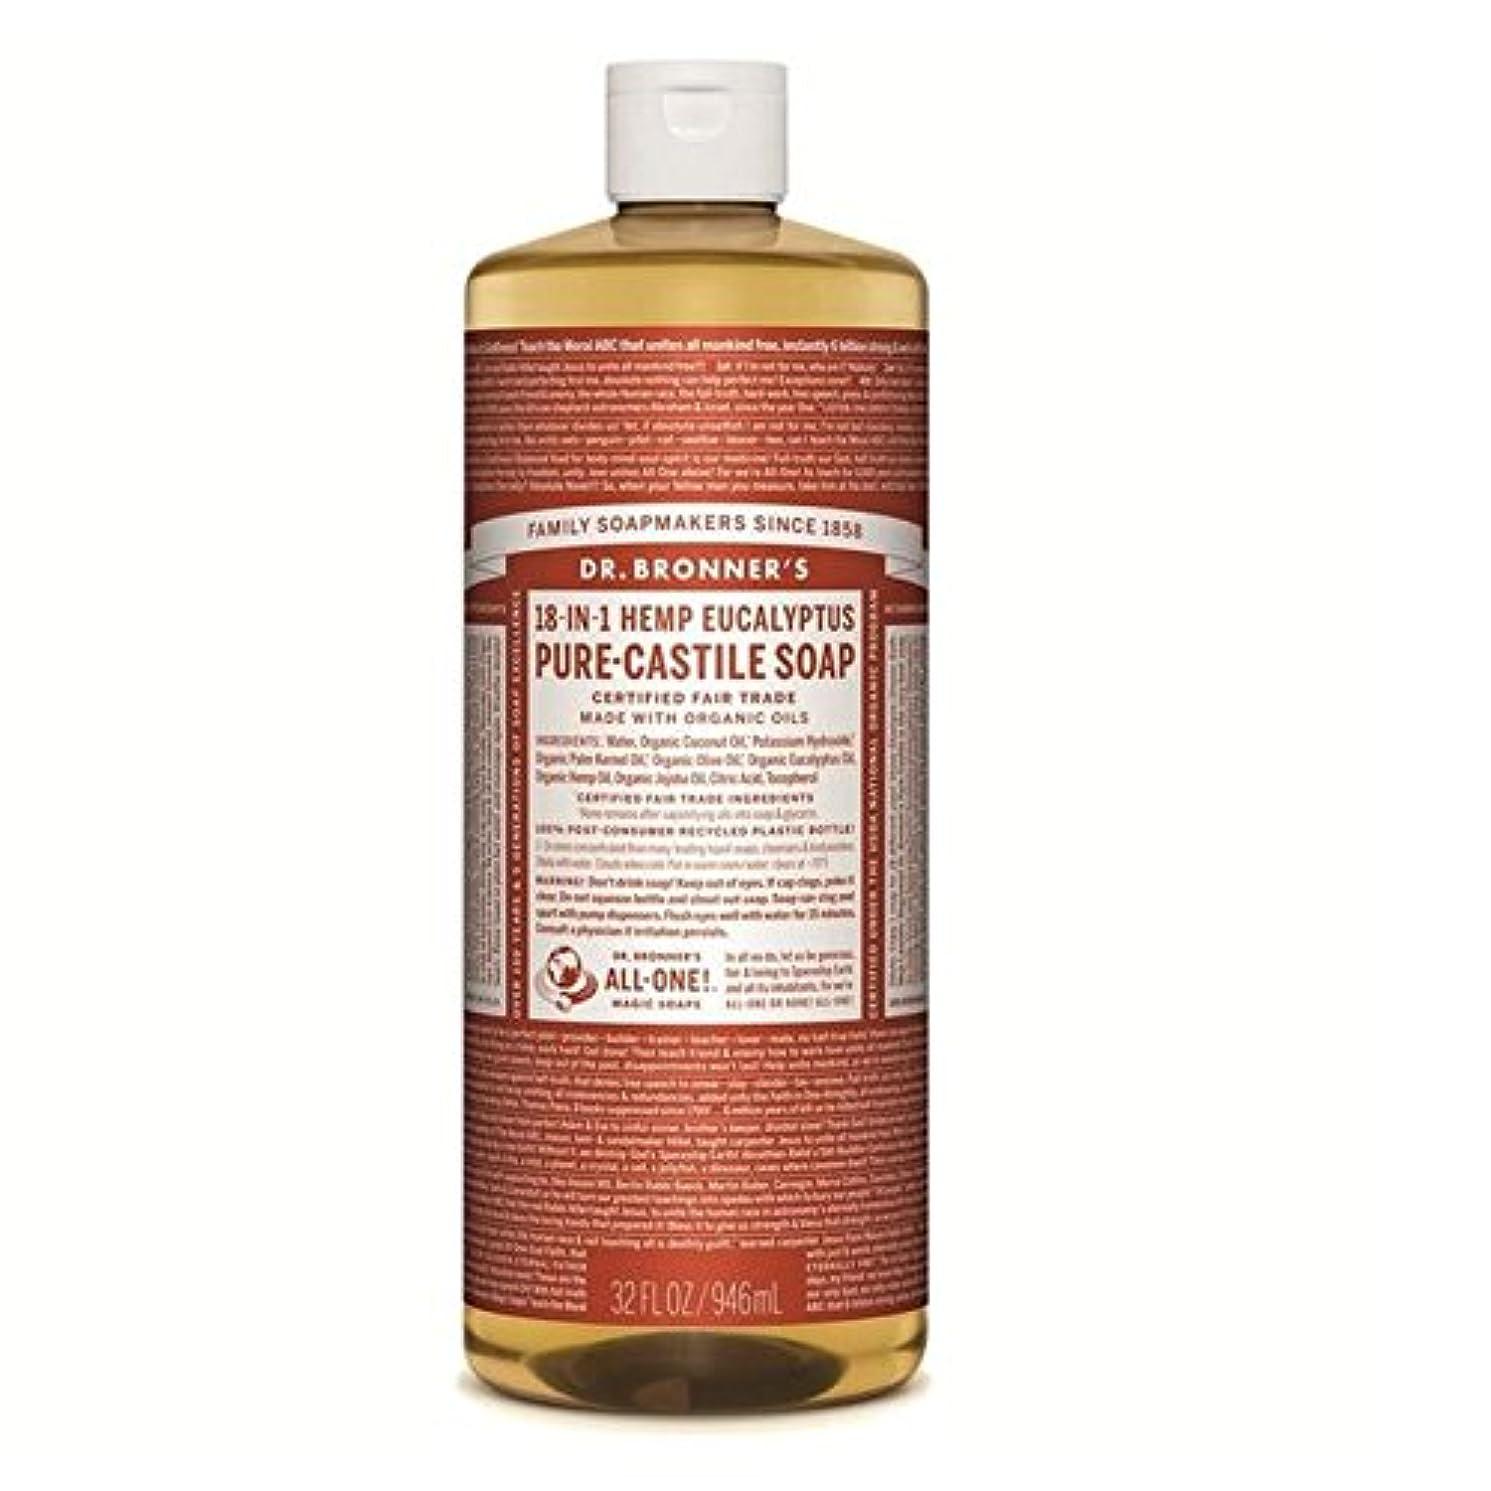 Dr Bronner Organic Eucalyptus Castile Liquid Soap 946ml (Pack of 6) - のブロナー有機ユーカリカスティーリャ液体石鹸946ミリリットル x6 [並行輸入品]